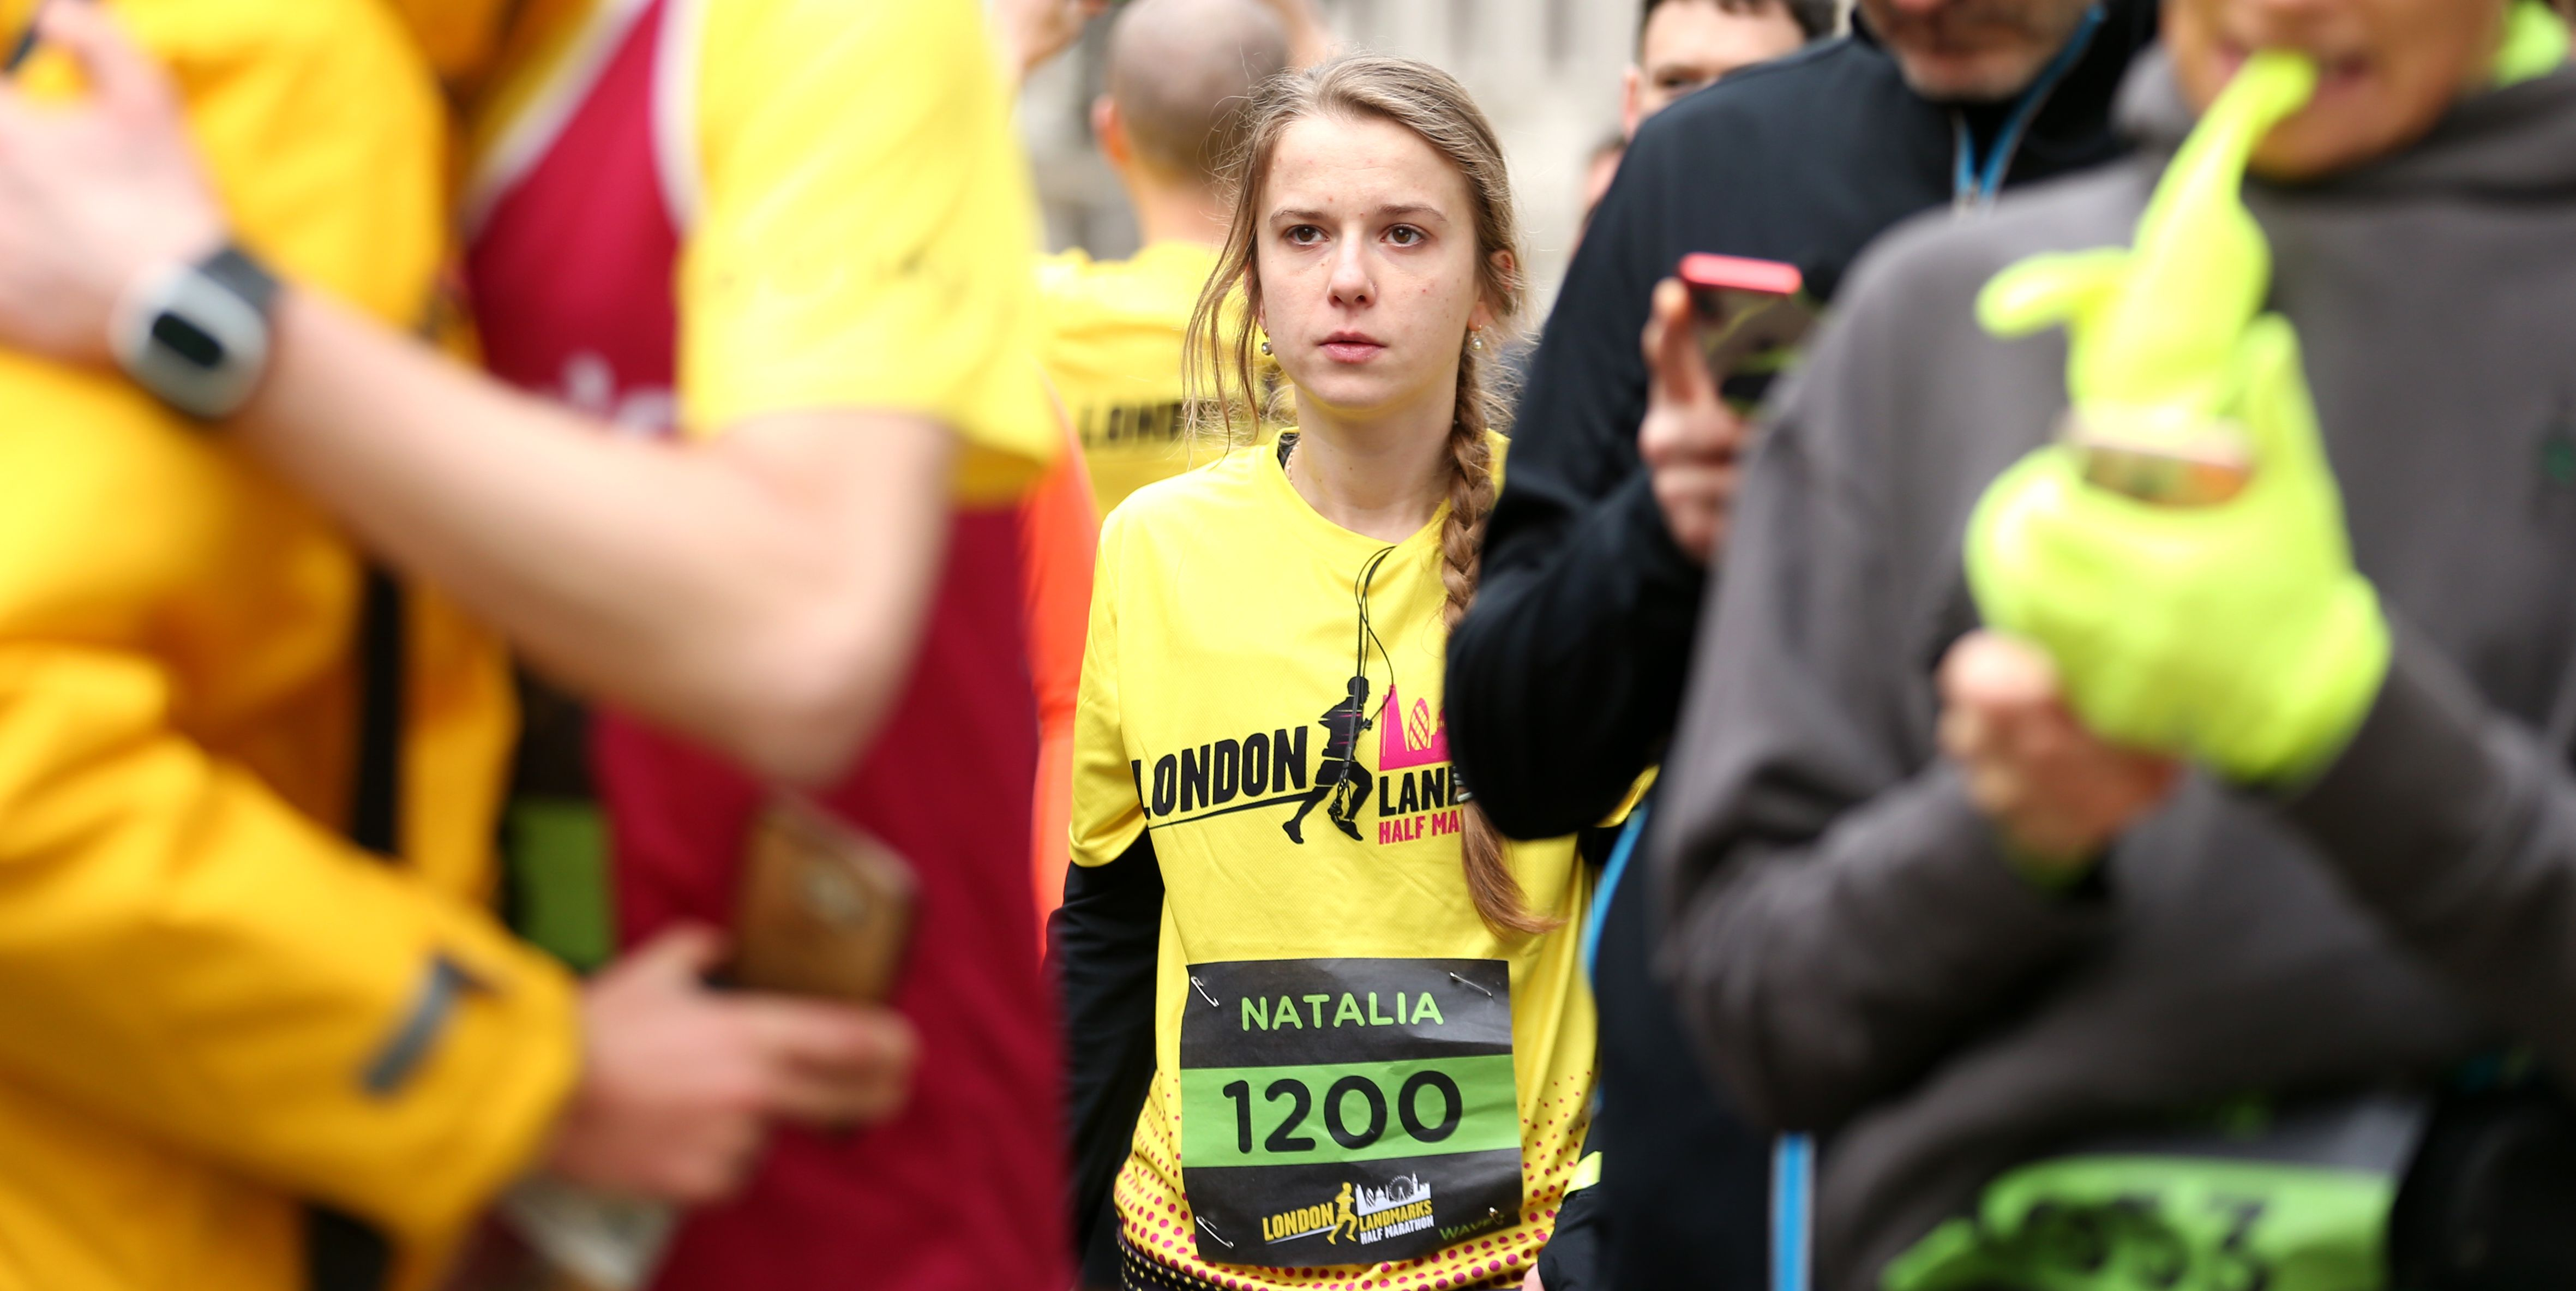 2018 London Landmarks Half Marathon